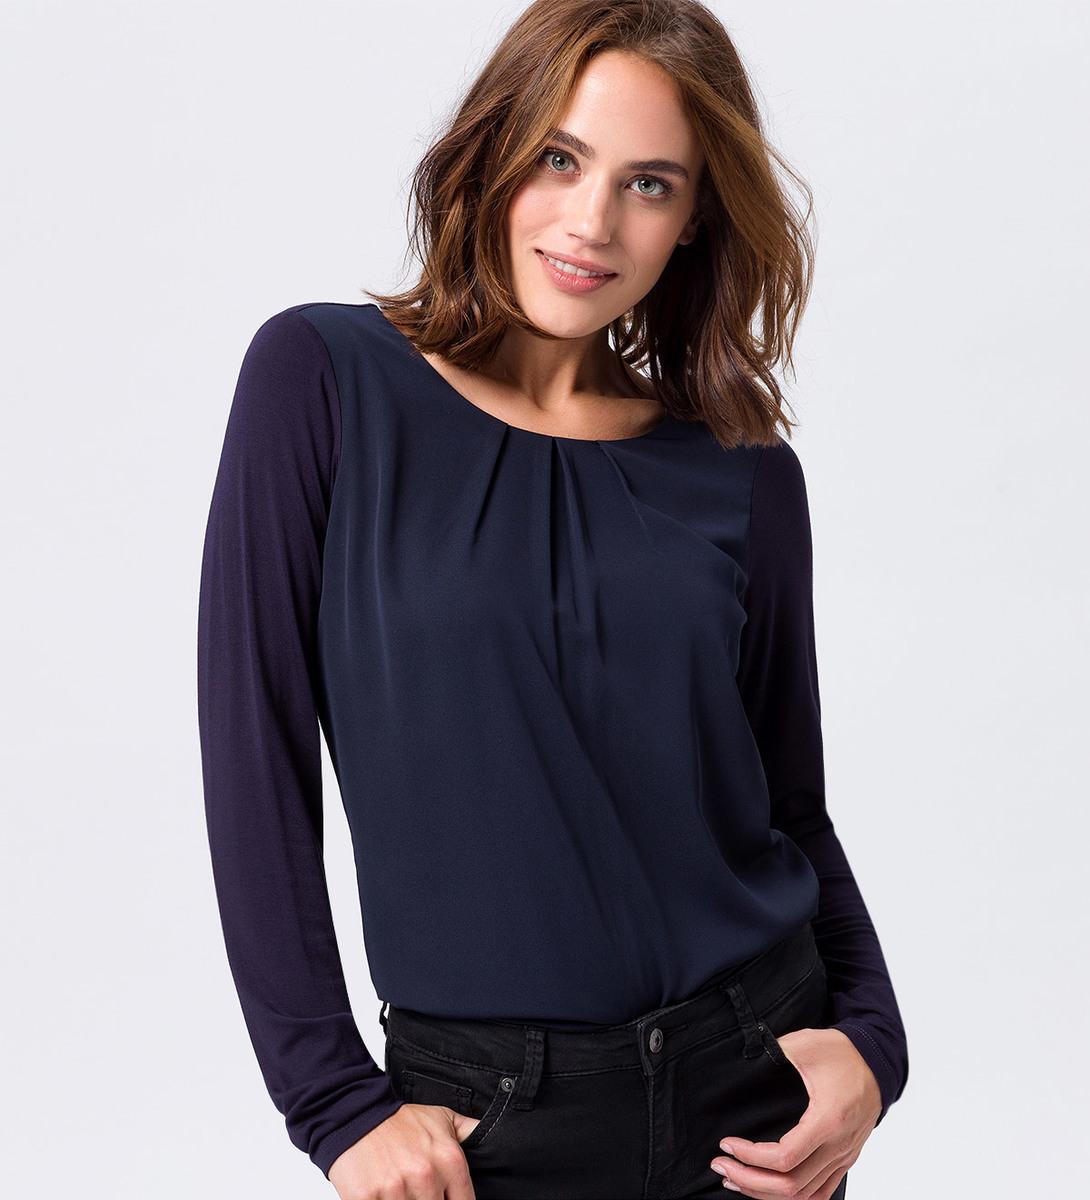 Blusenshirt in blue black